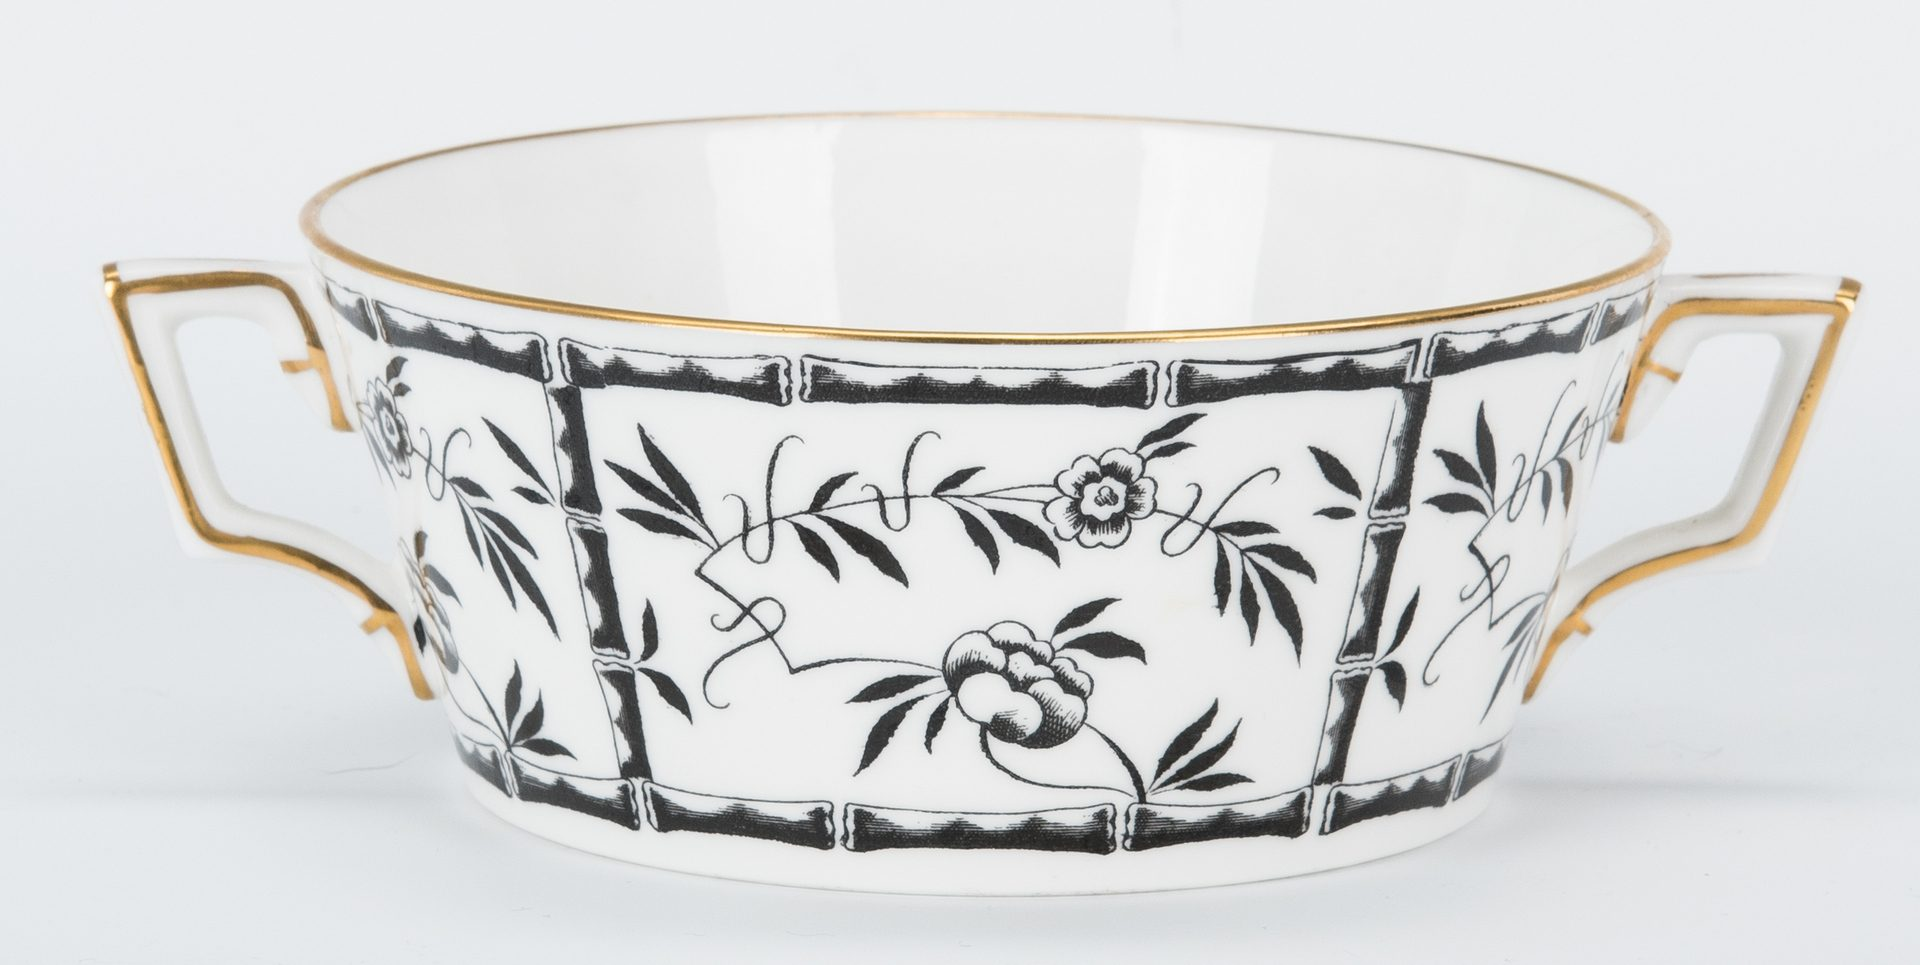 Lot 265: Tiffany retailed Black Bamboo Porcelain by Hammersley, 57 pcs.